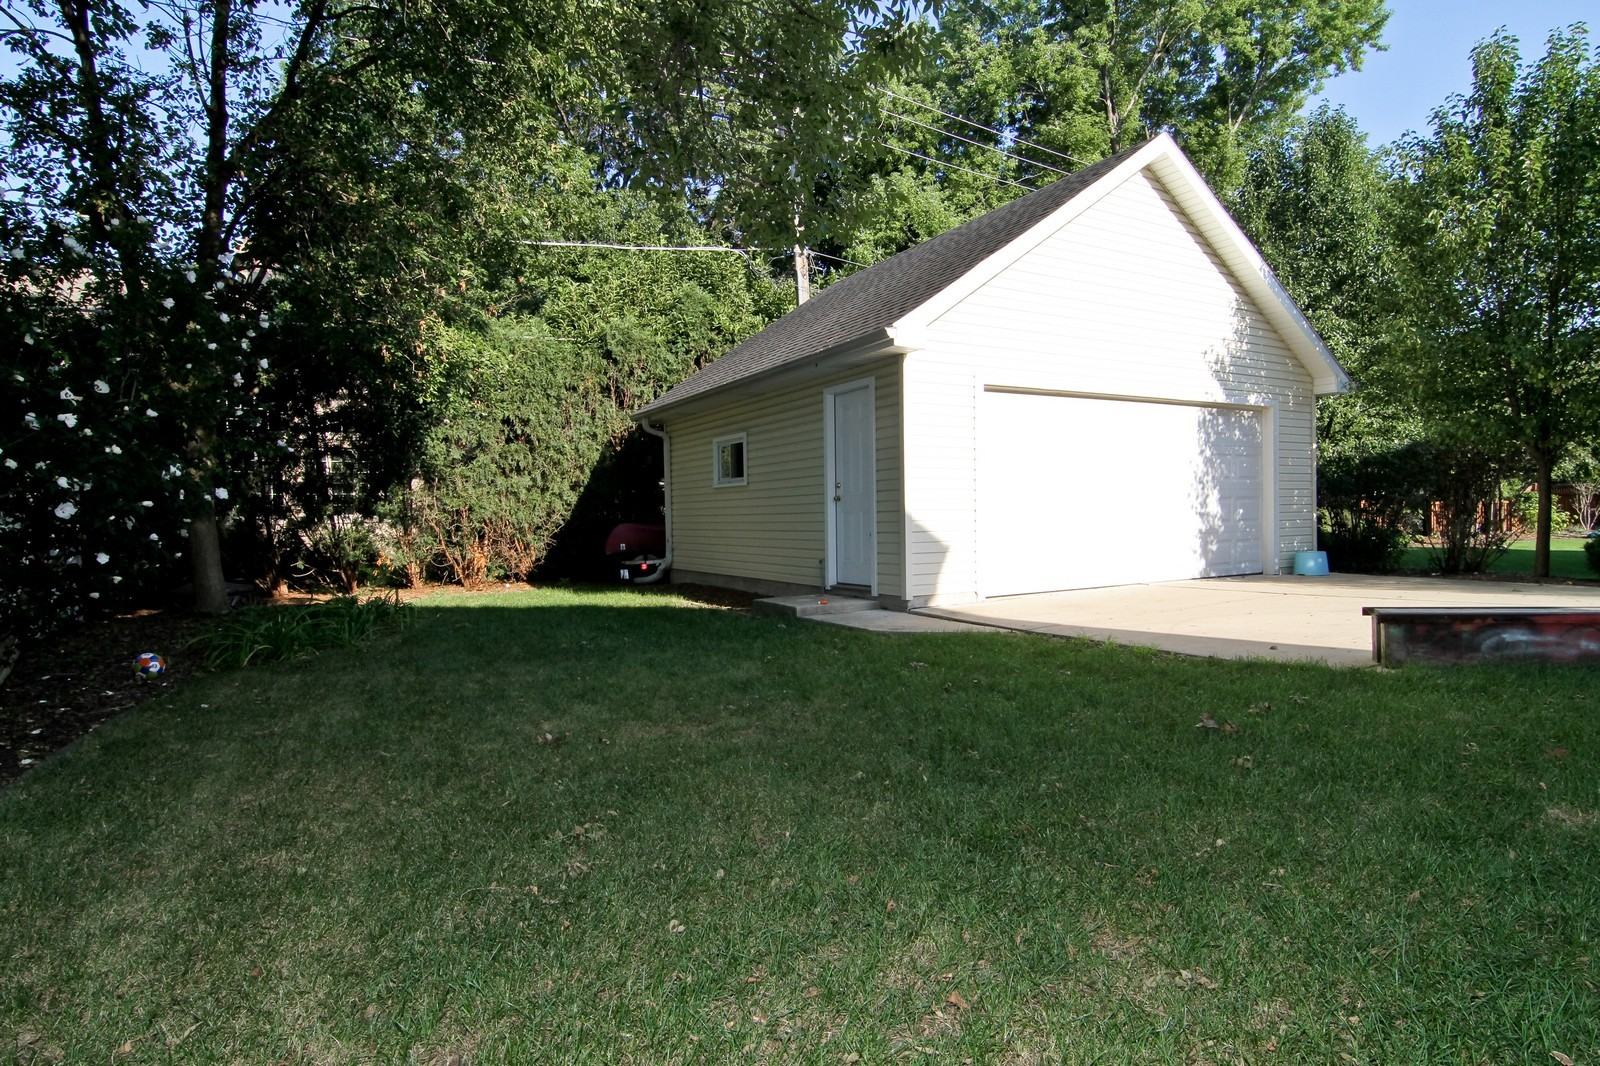 Real Estate Photography - 441 Edgewood Dr, La Grange, IL, 60525 - Back Yard